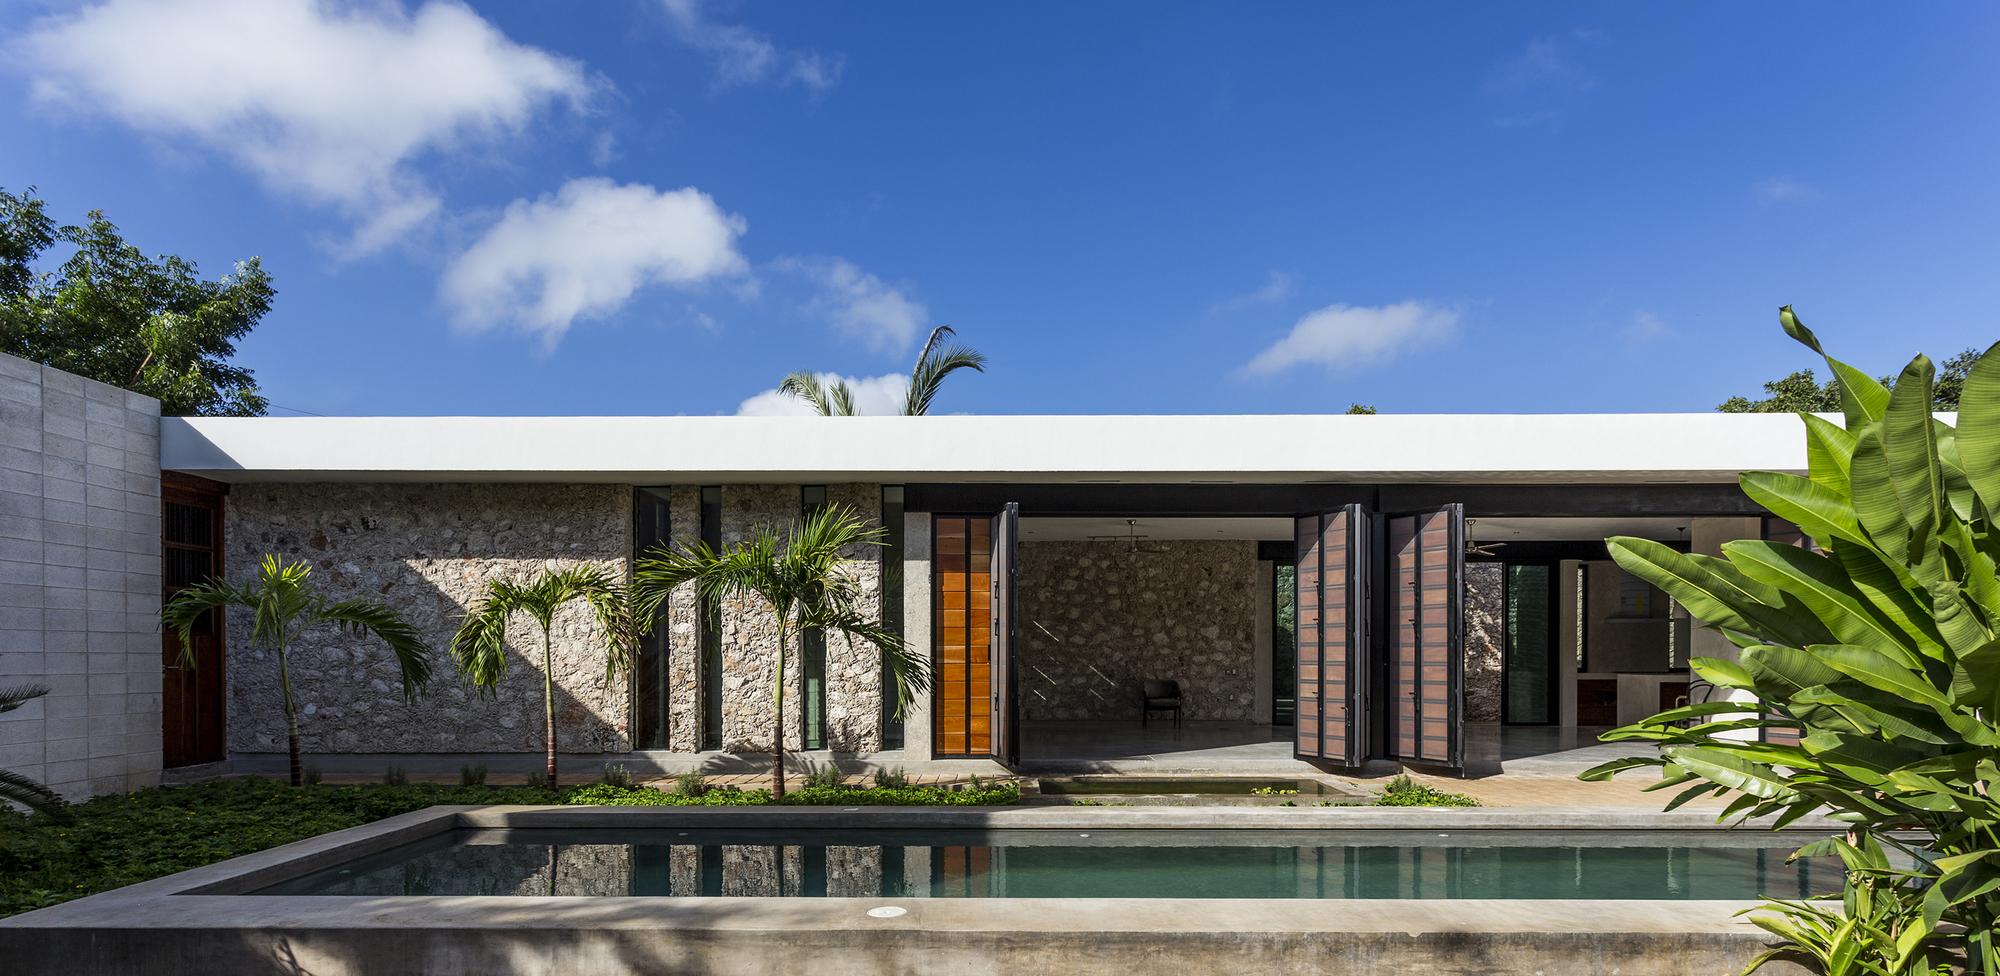 Casa ja cholul taller estilo arquitectura plataforma for Estilos de casas arquitectura